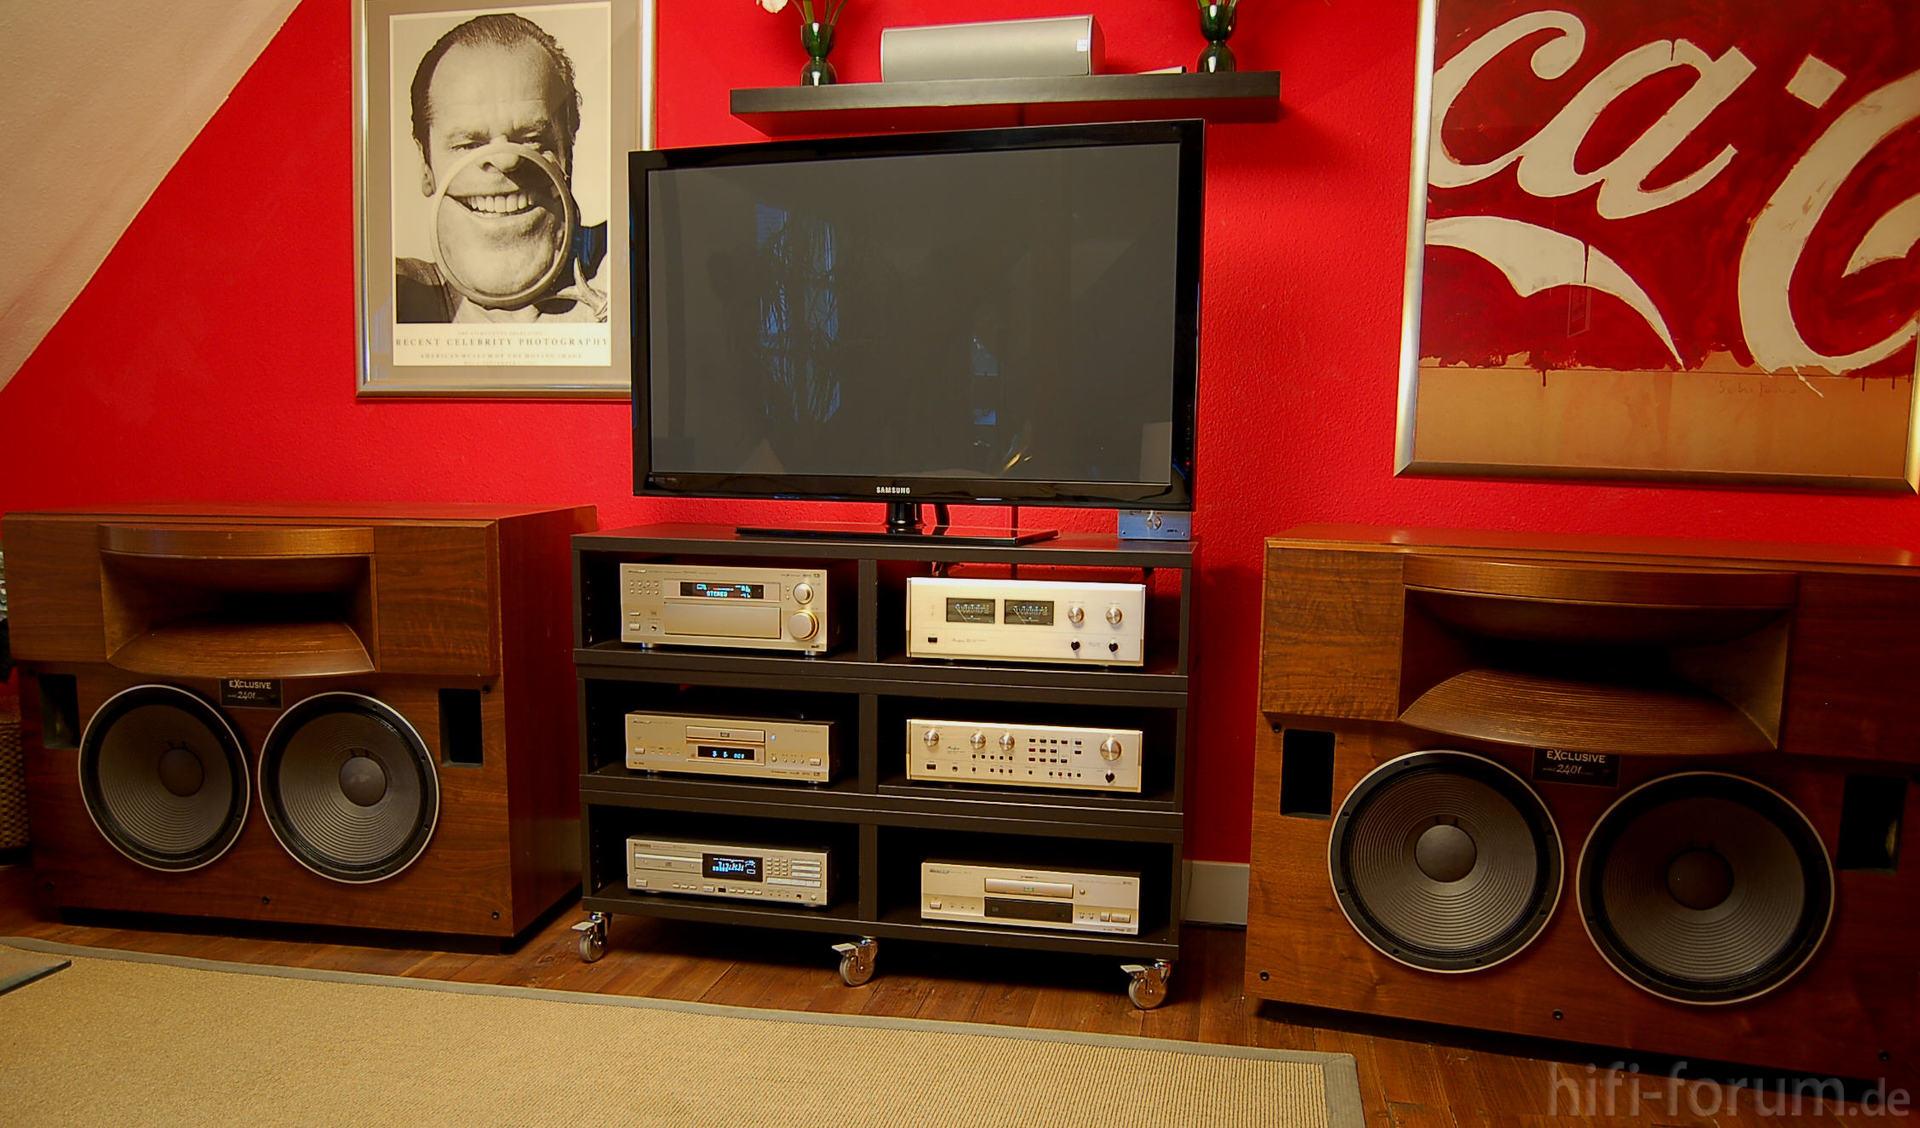 g 7000 001 g7000 hifi bildergalerie. Black Bedroom Furniture Sets. Home Design Ideas